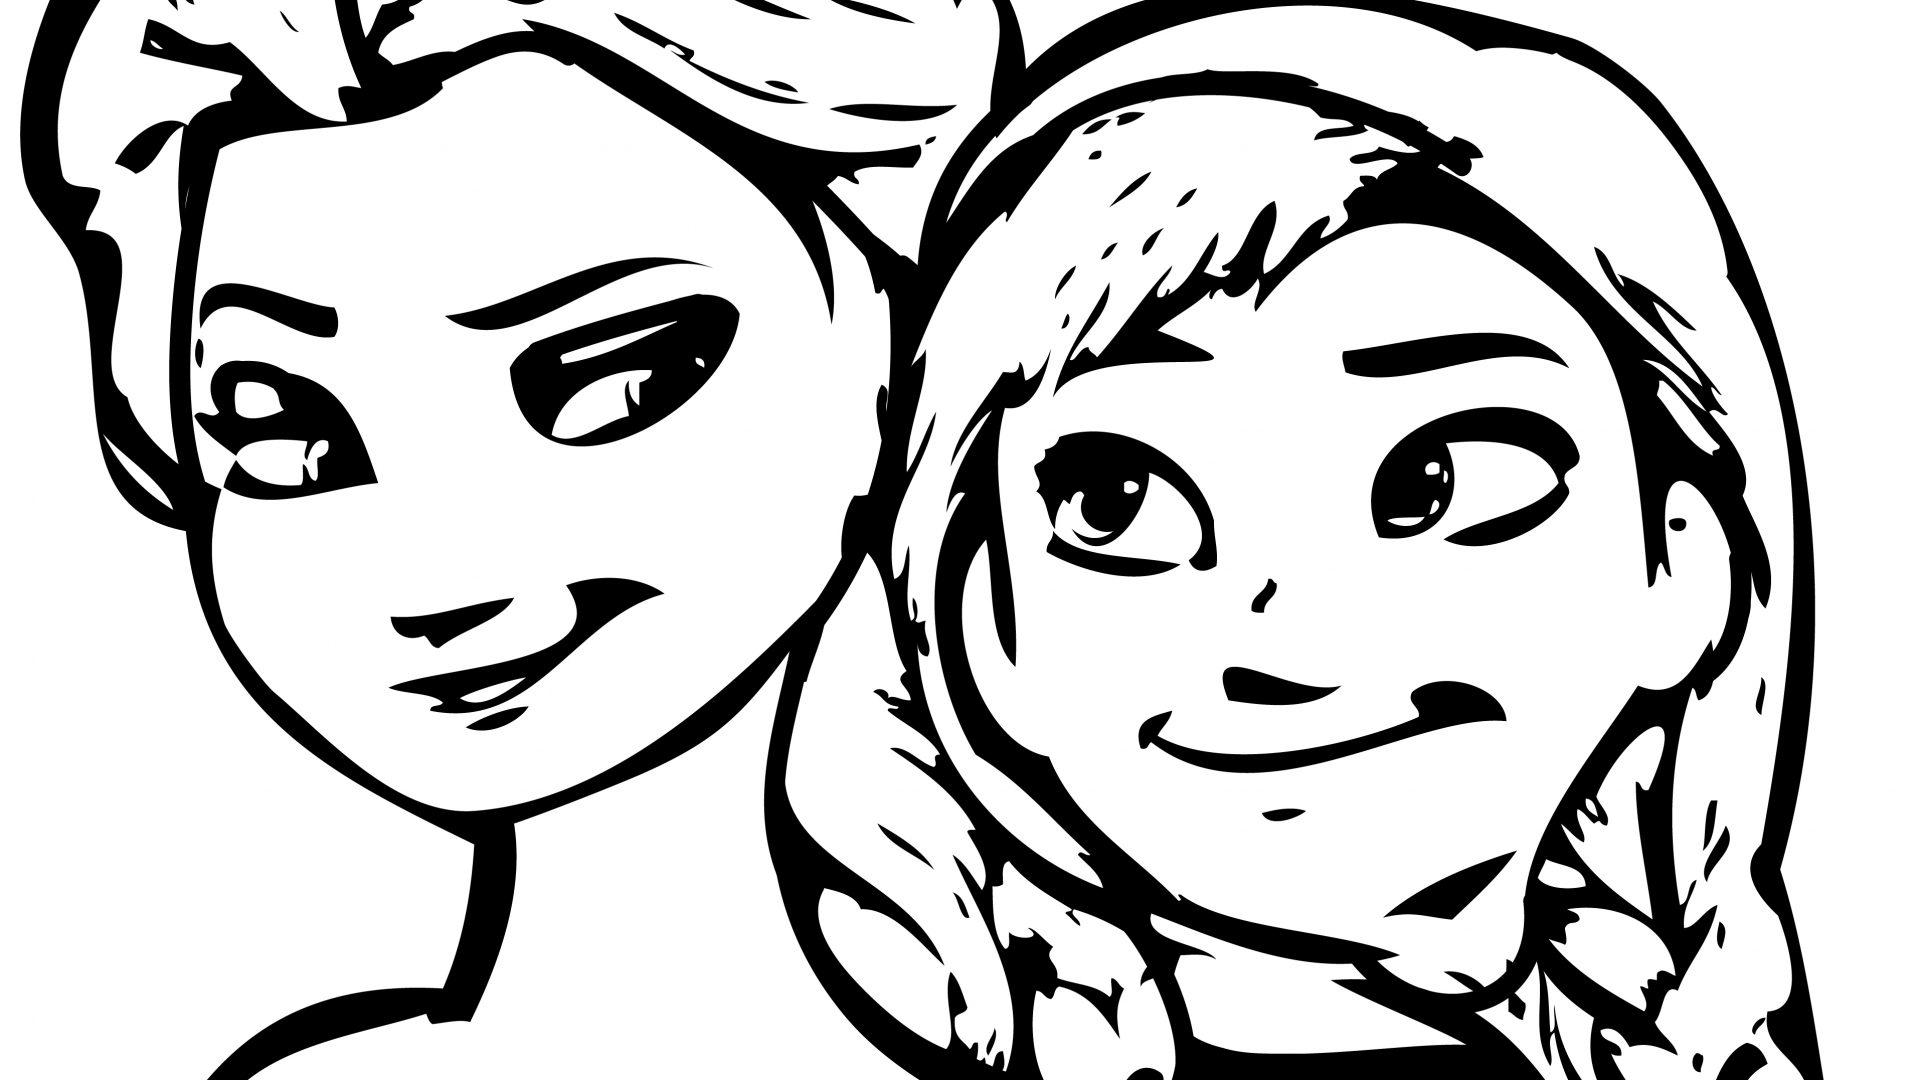 1920x1080 Coloring Pages Disney Frozen Cartoon Elsa And Anna Cartoons